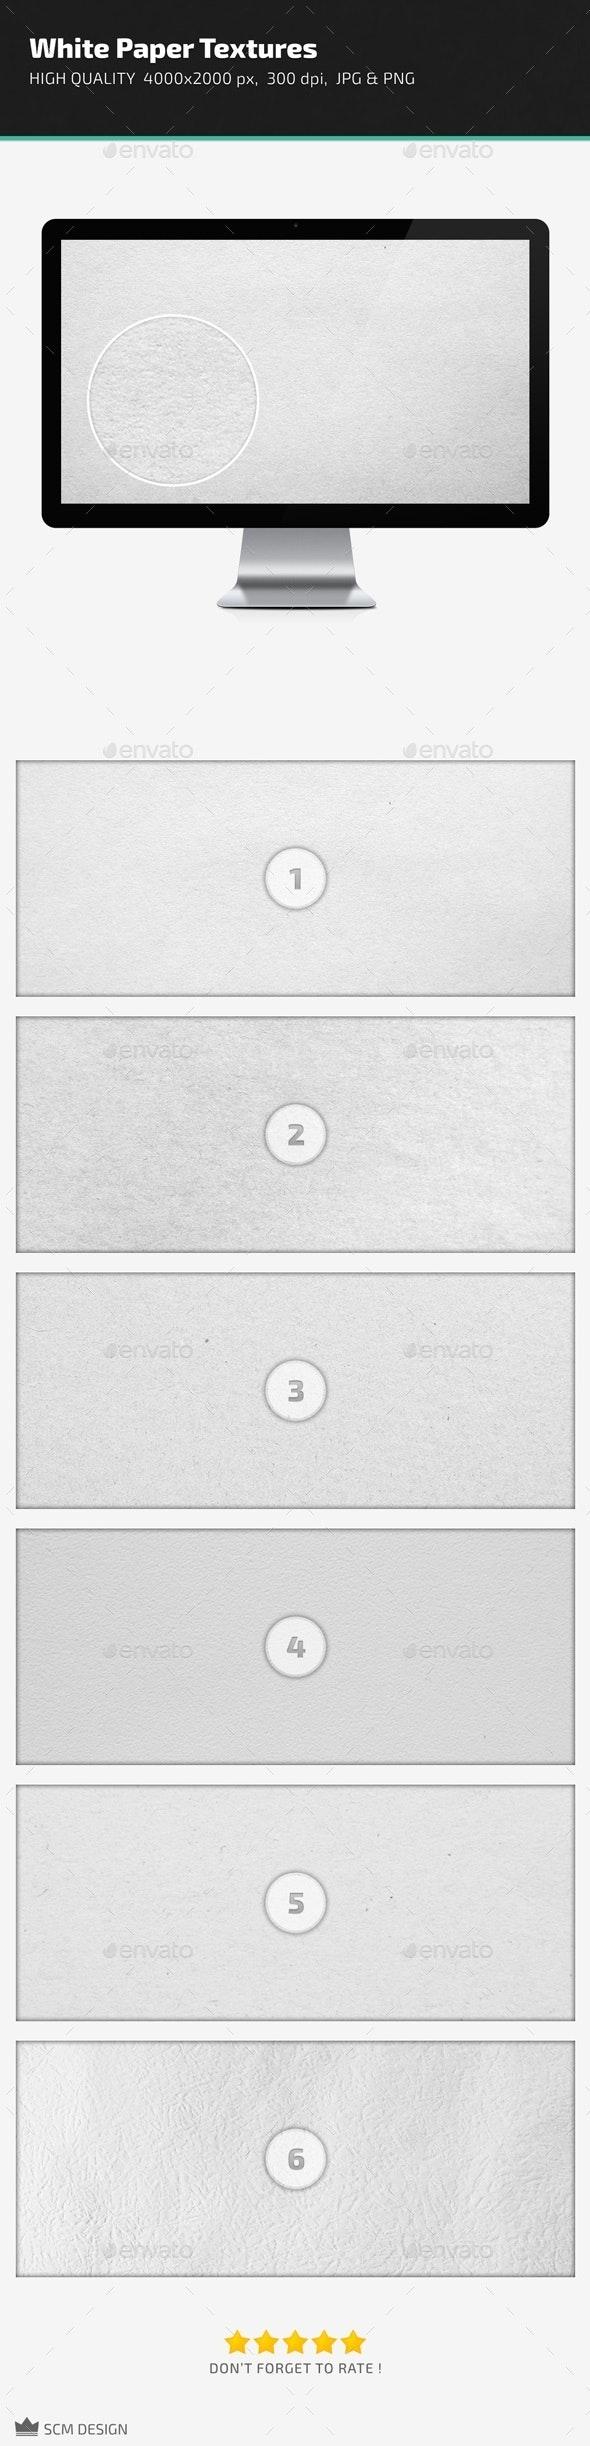 White Paper Textures - Paper Textures